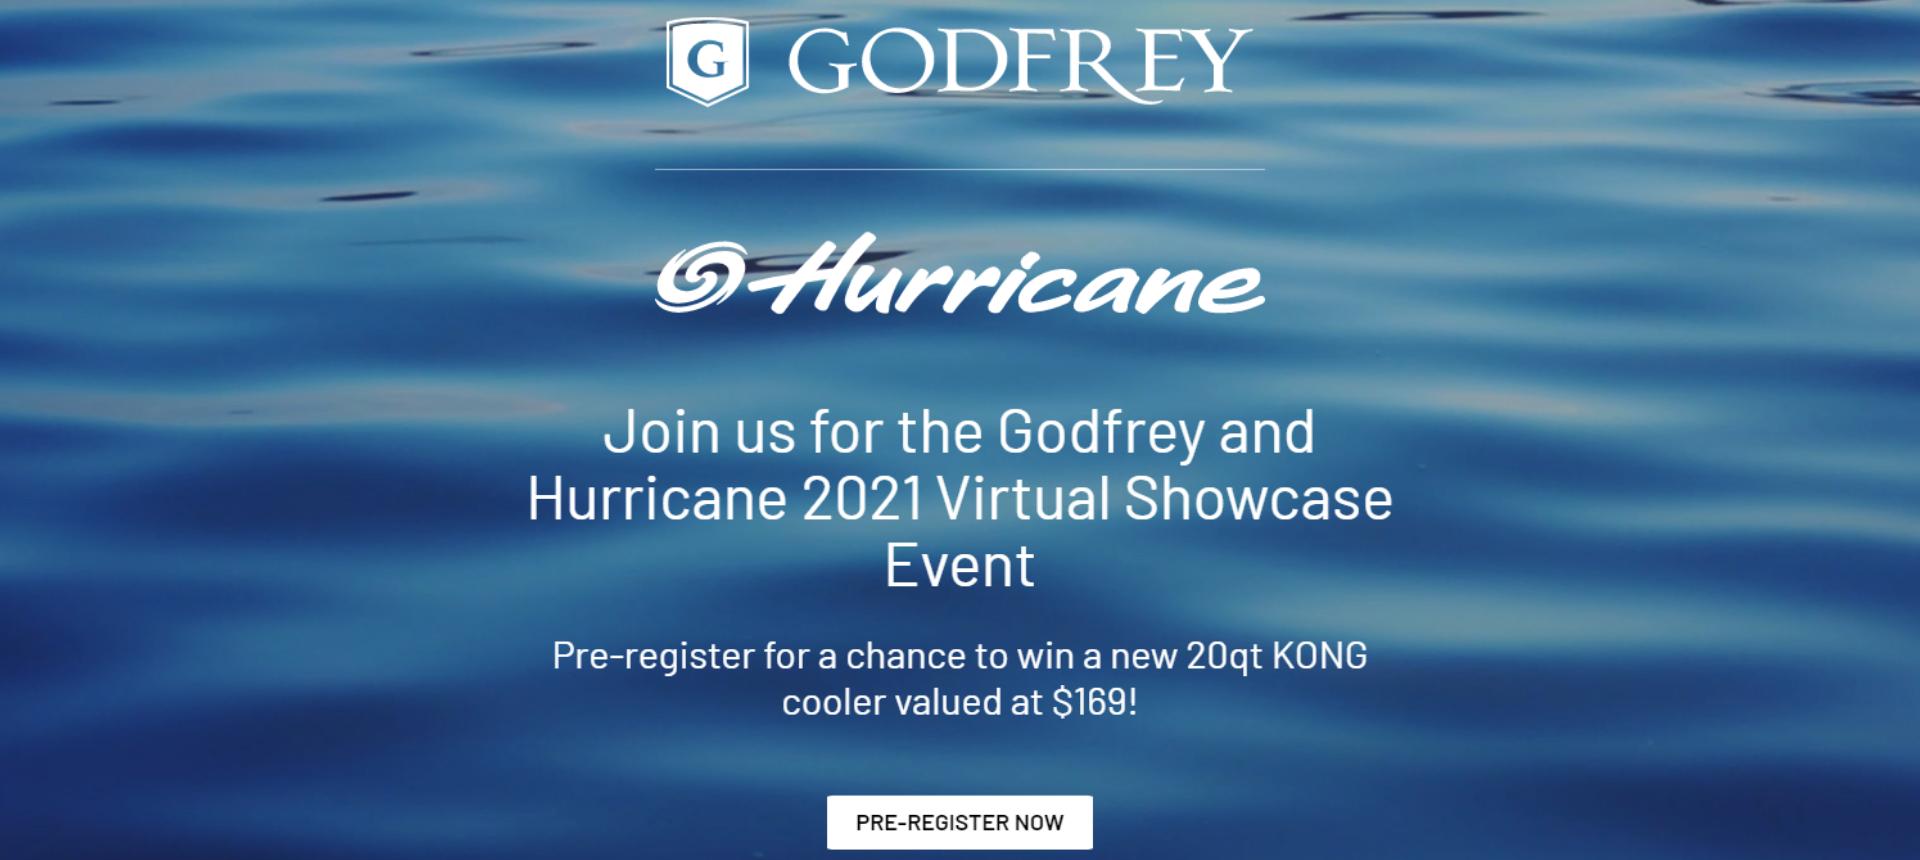 Godfrey virtual show 2021